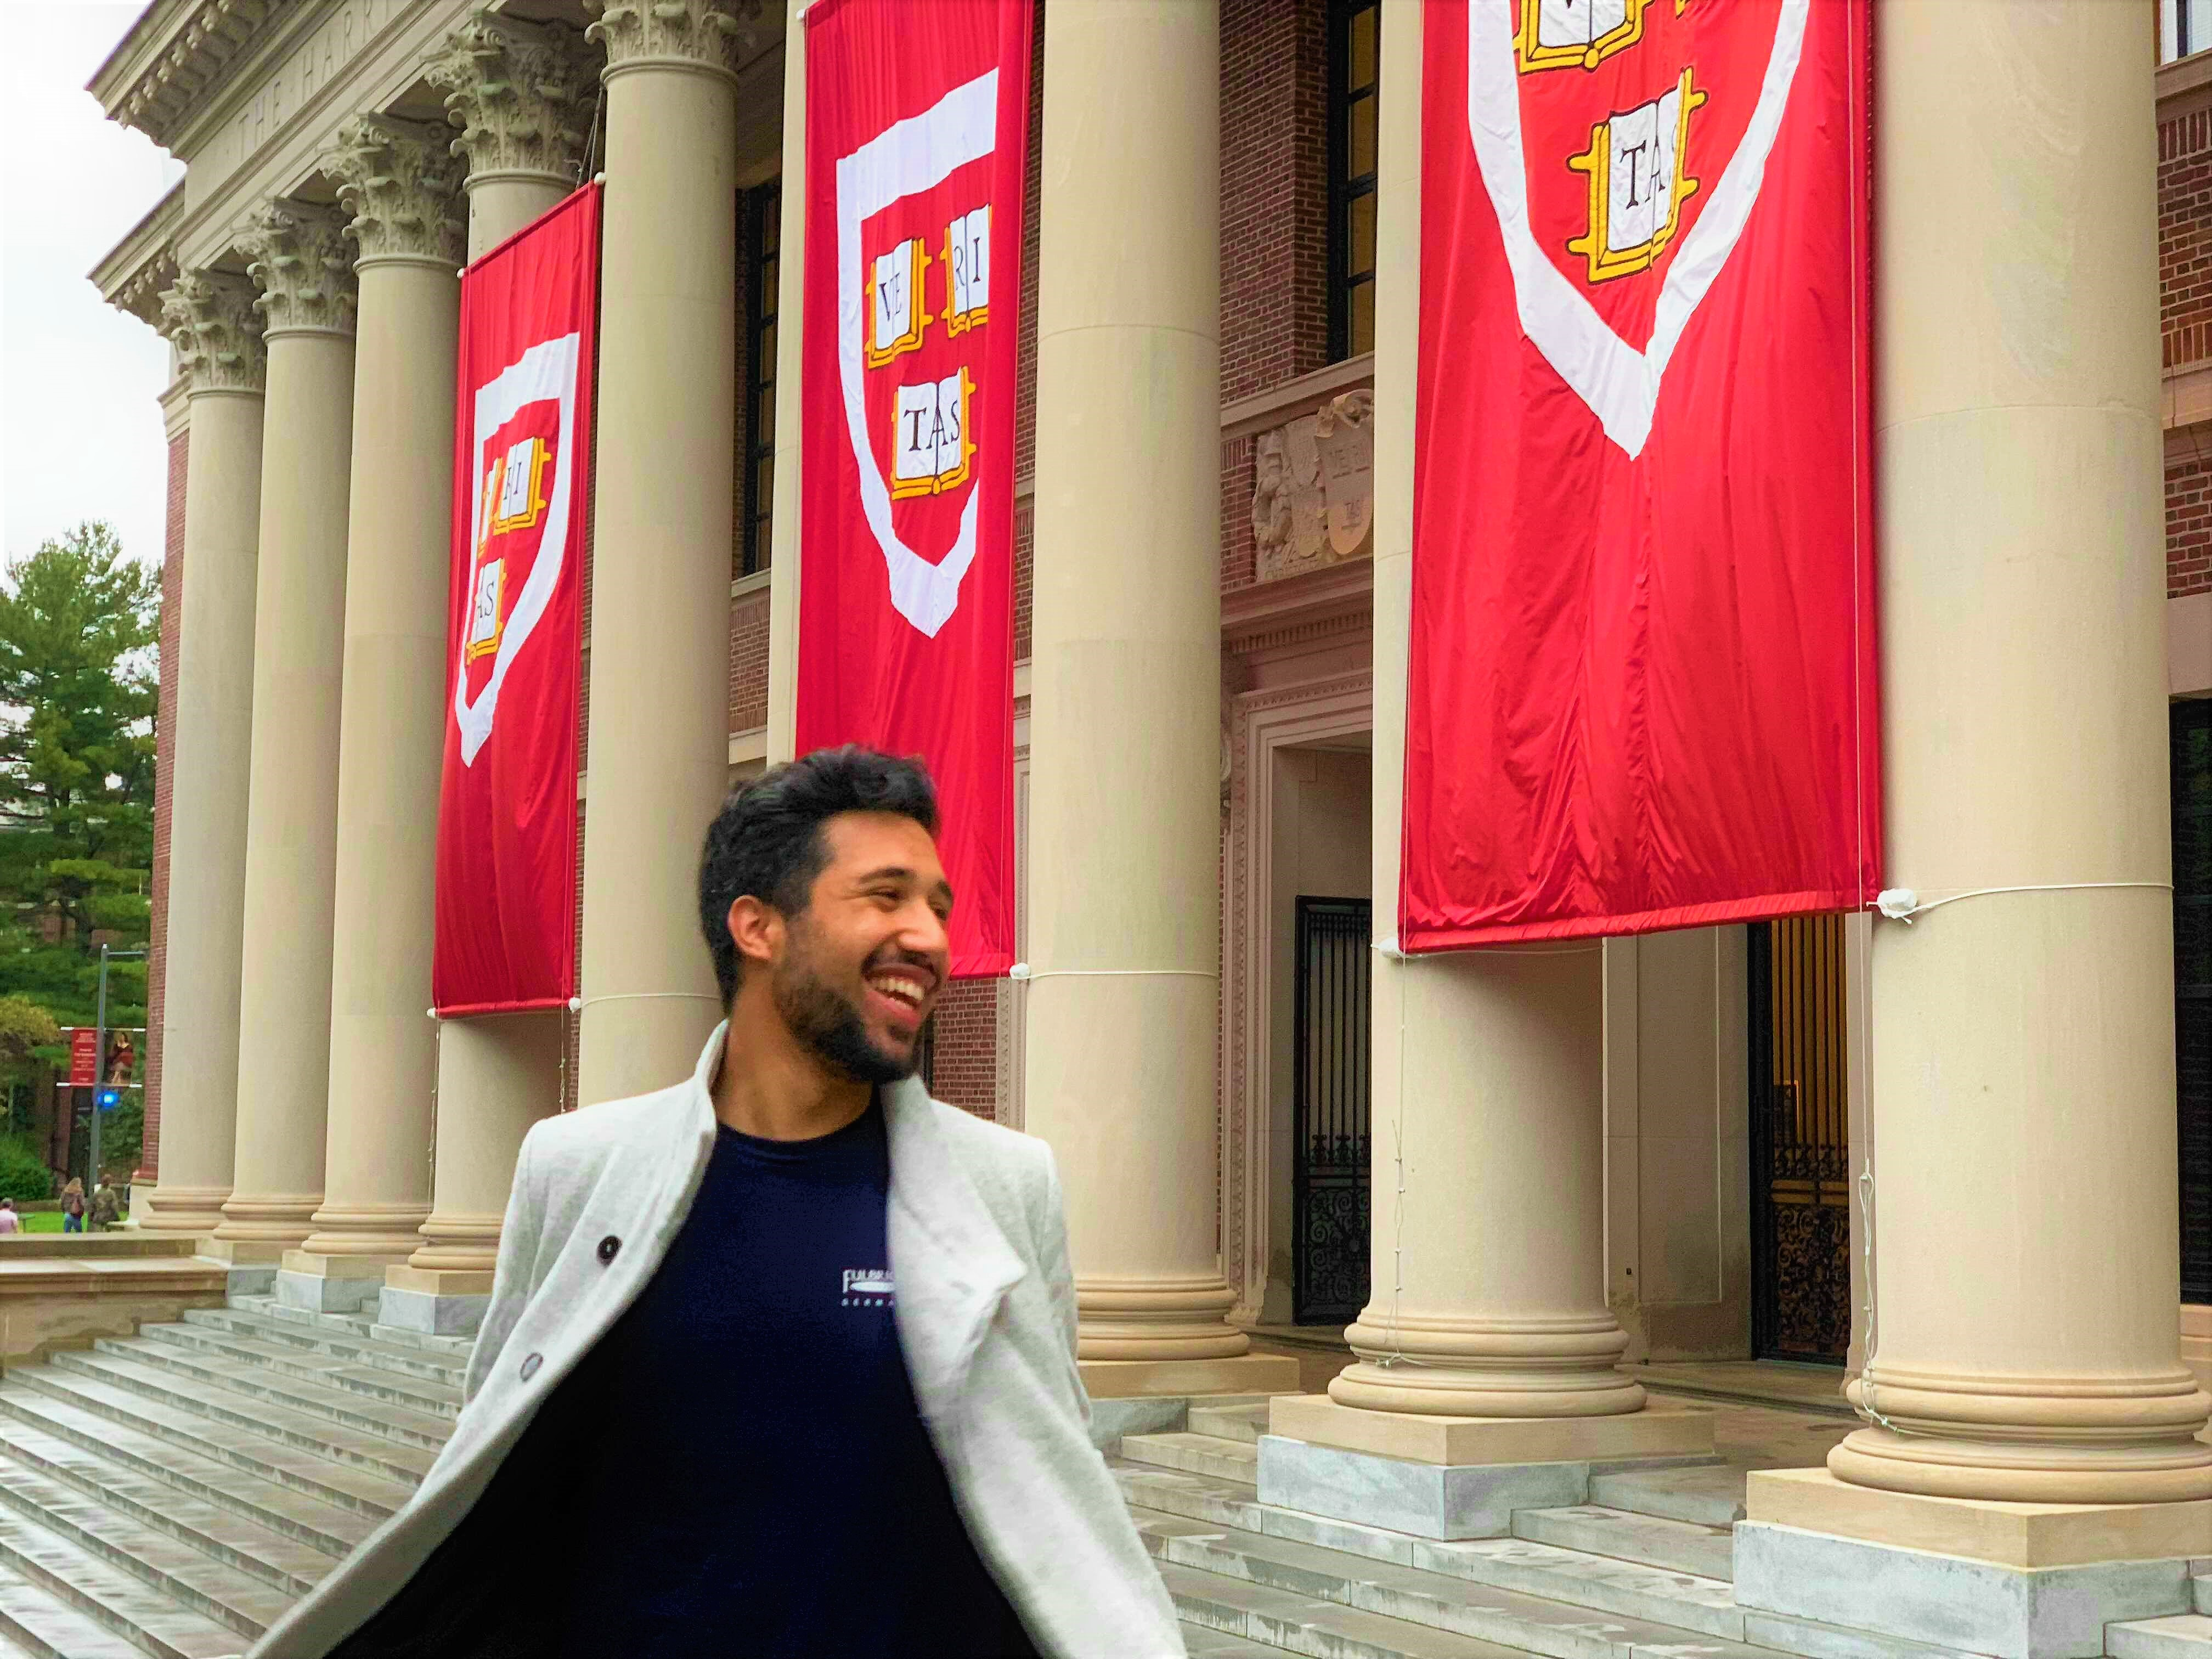 Die 8 interessantesten Harvard-Facts